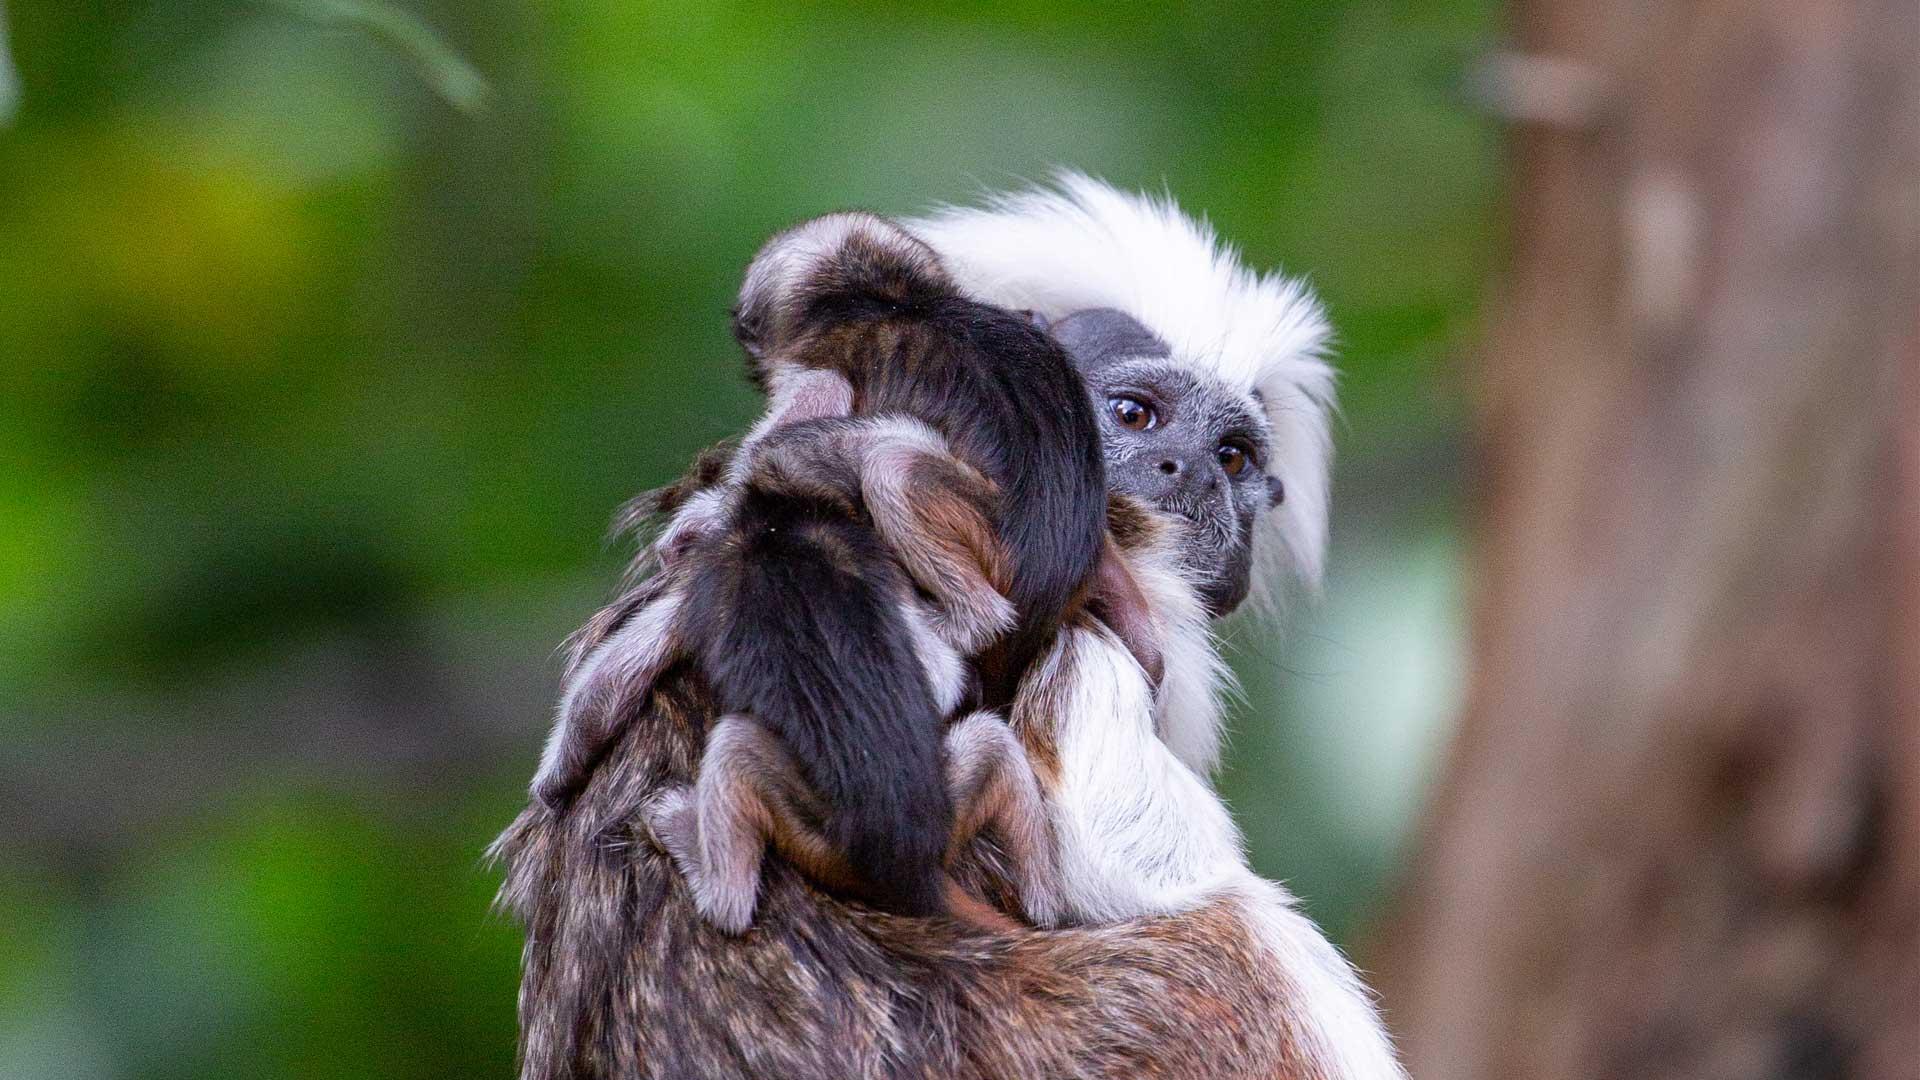 https://rfacdn.nz/zoo/assets/media/cotton-top-babies-gallery-1.jpg